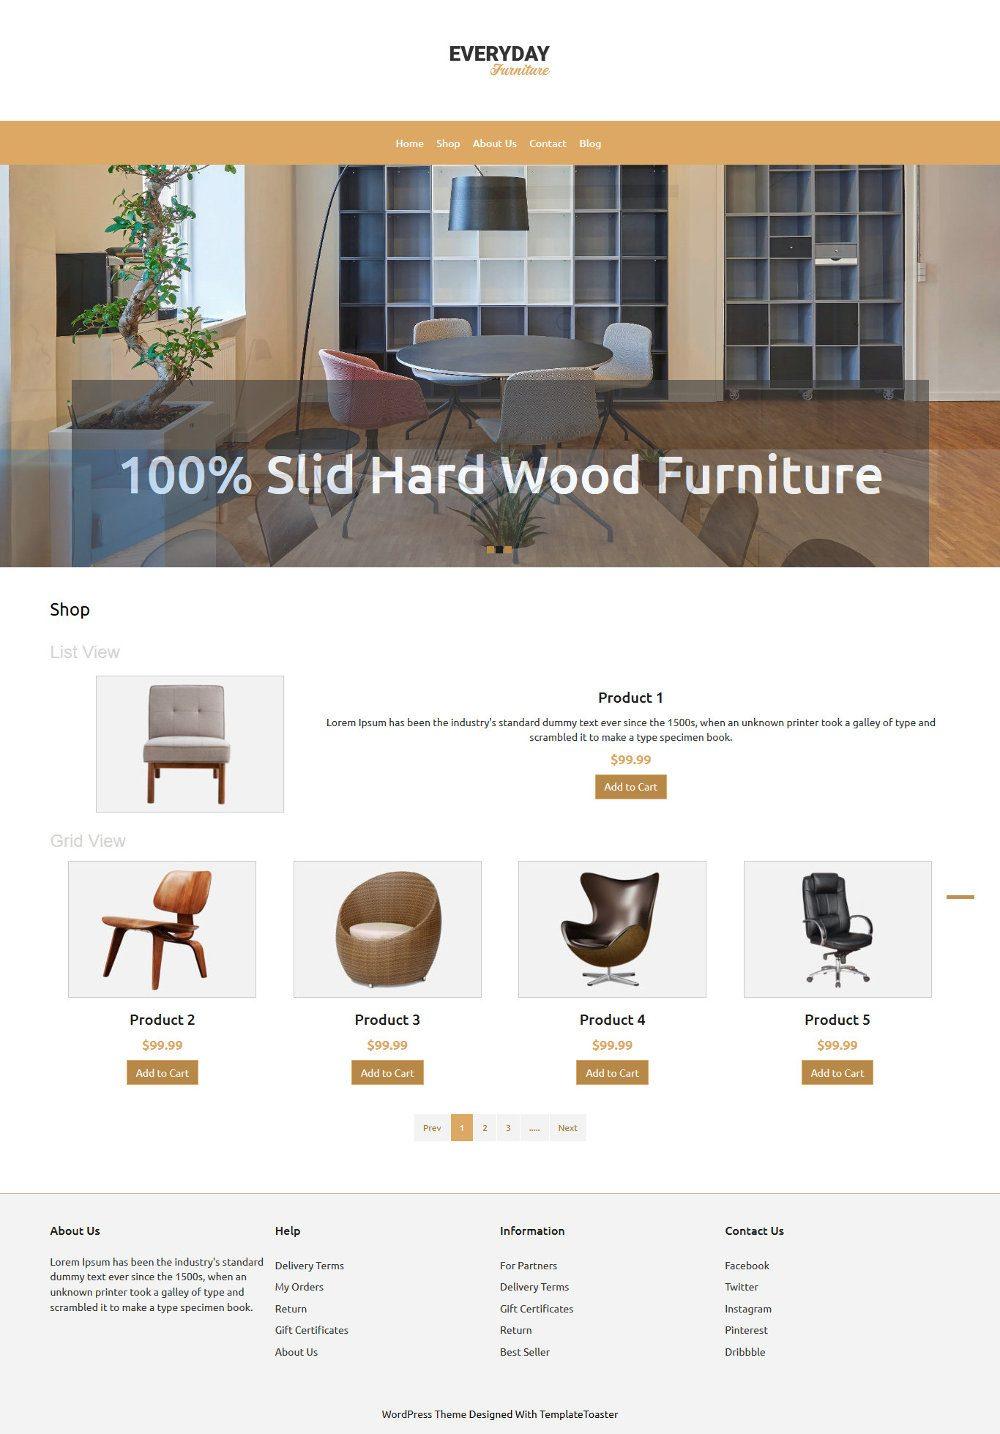 Everyday Furniture WooCommerce Theme